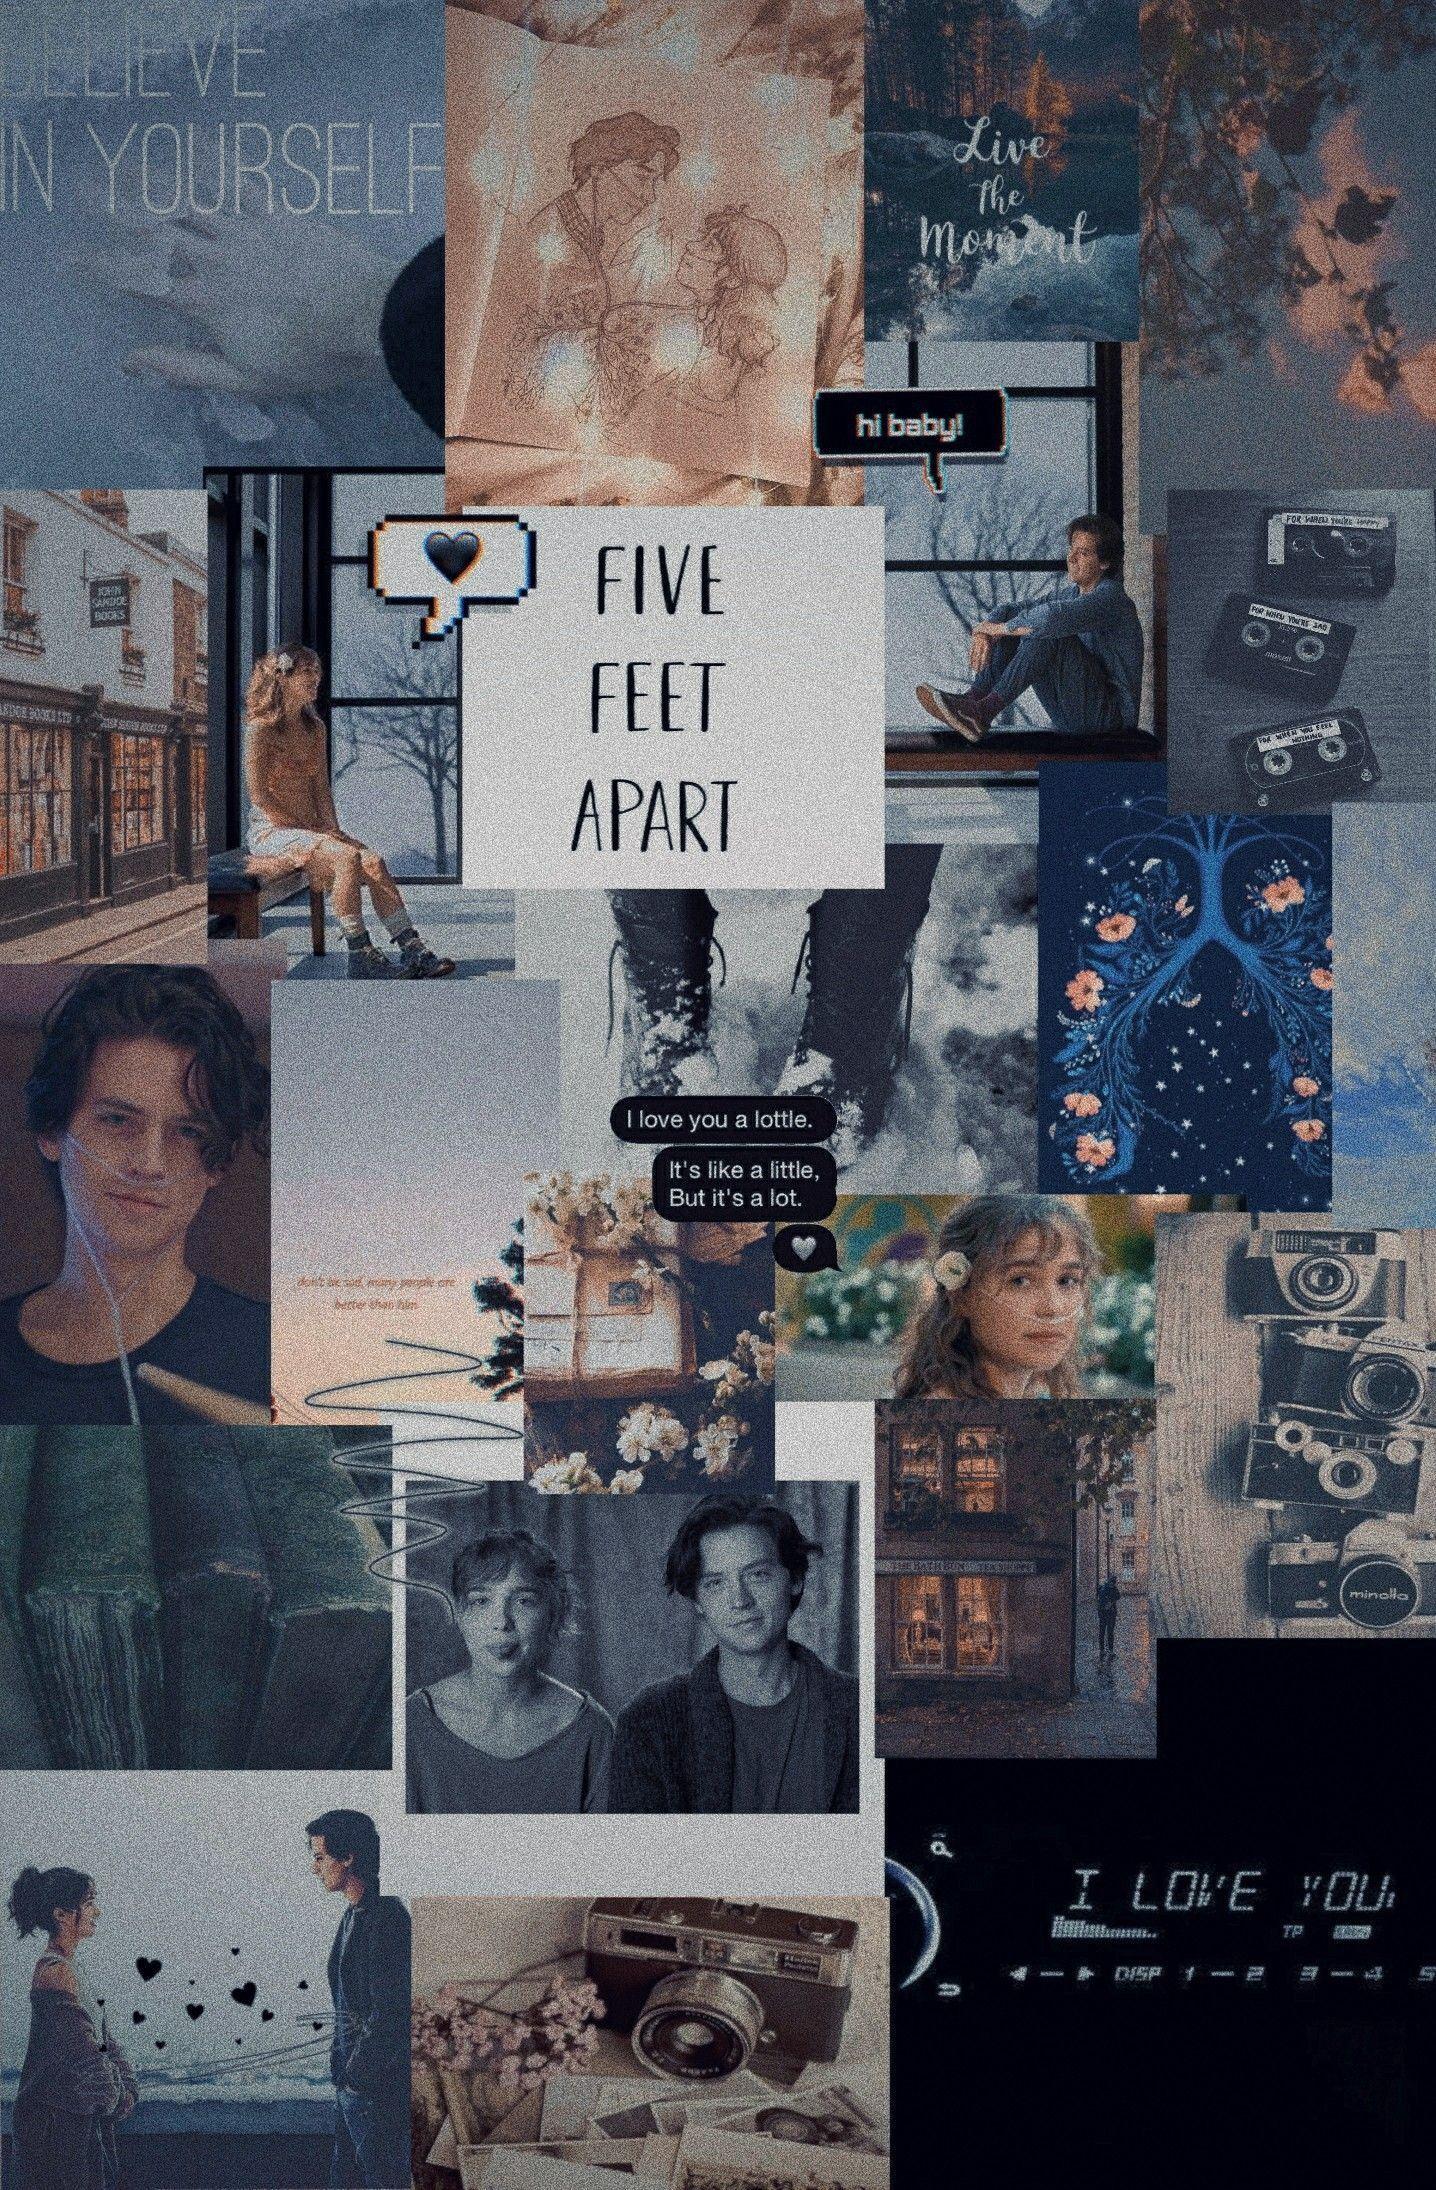 Five Feet Apart Five Feet Apart Effektive Bilder Die Wir Uber Decoraciones De Jardin Romantic Films Cole Sprouse Cole Sprouse Wallpaper